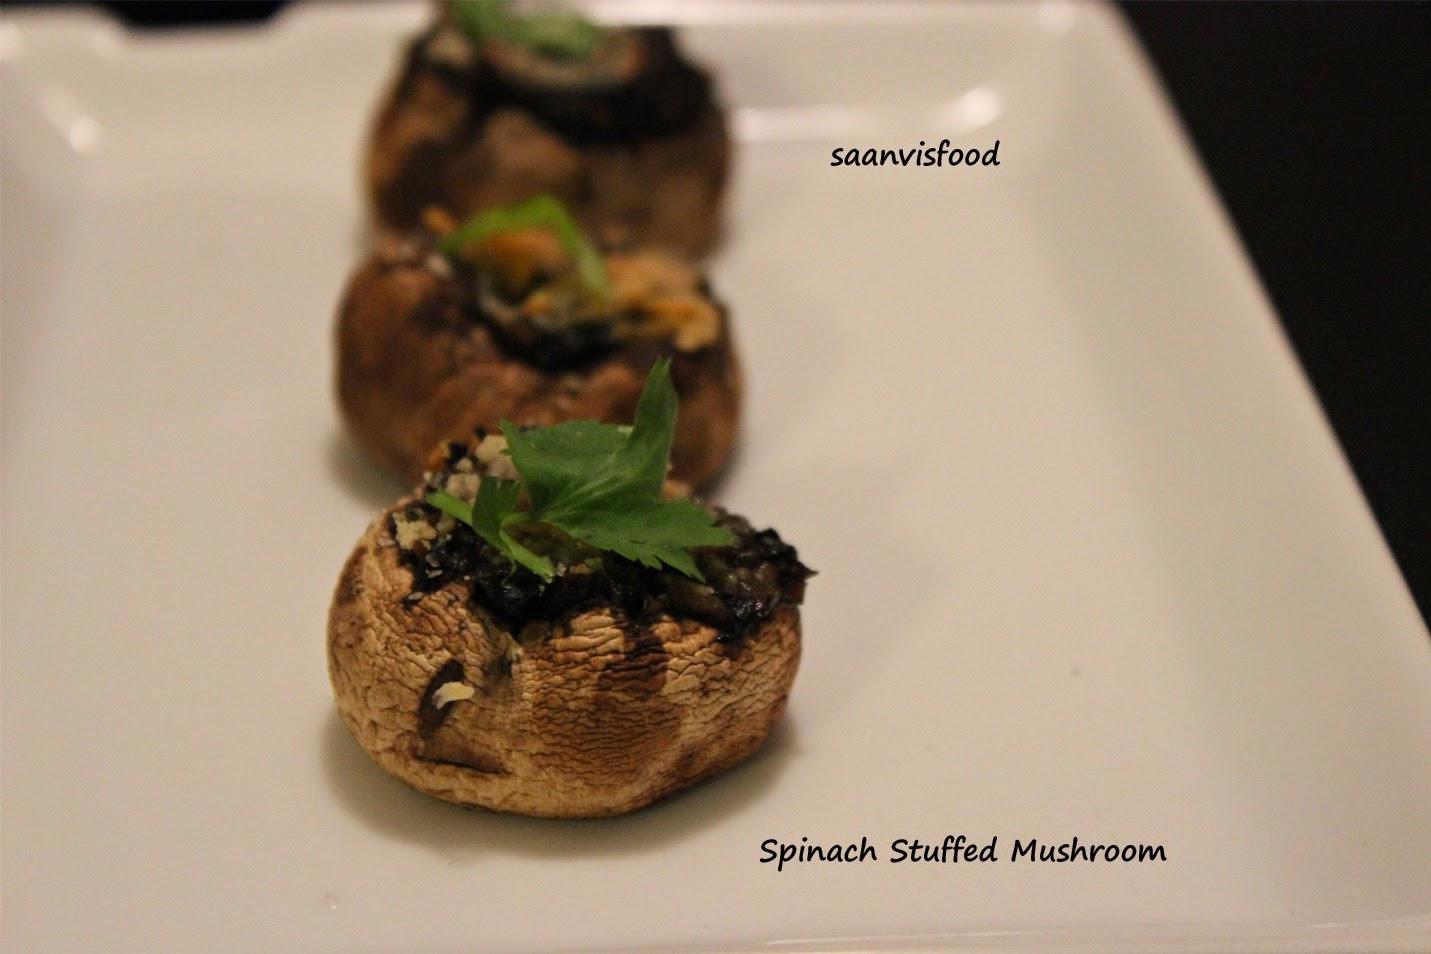 Spinach Stuffed Mushroom